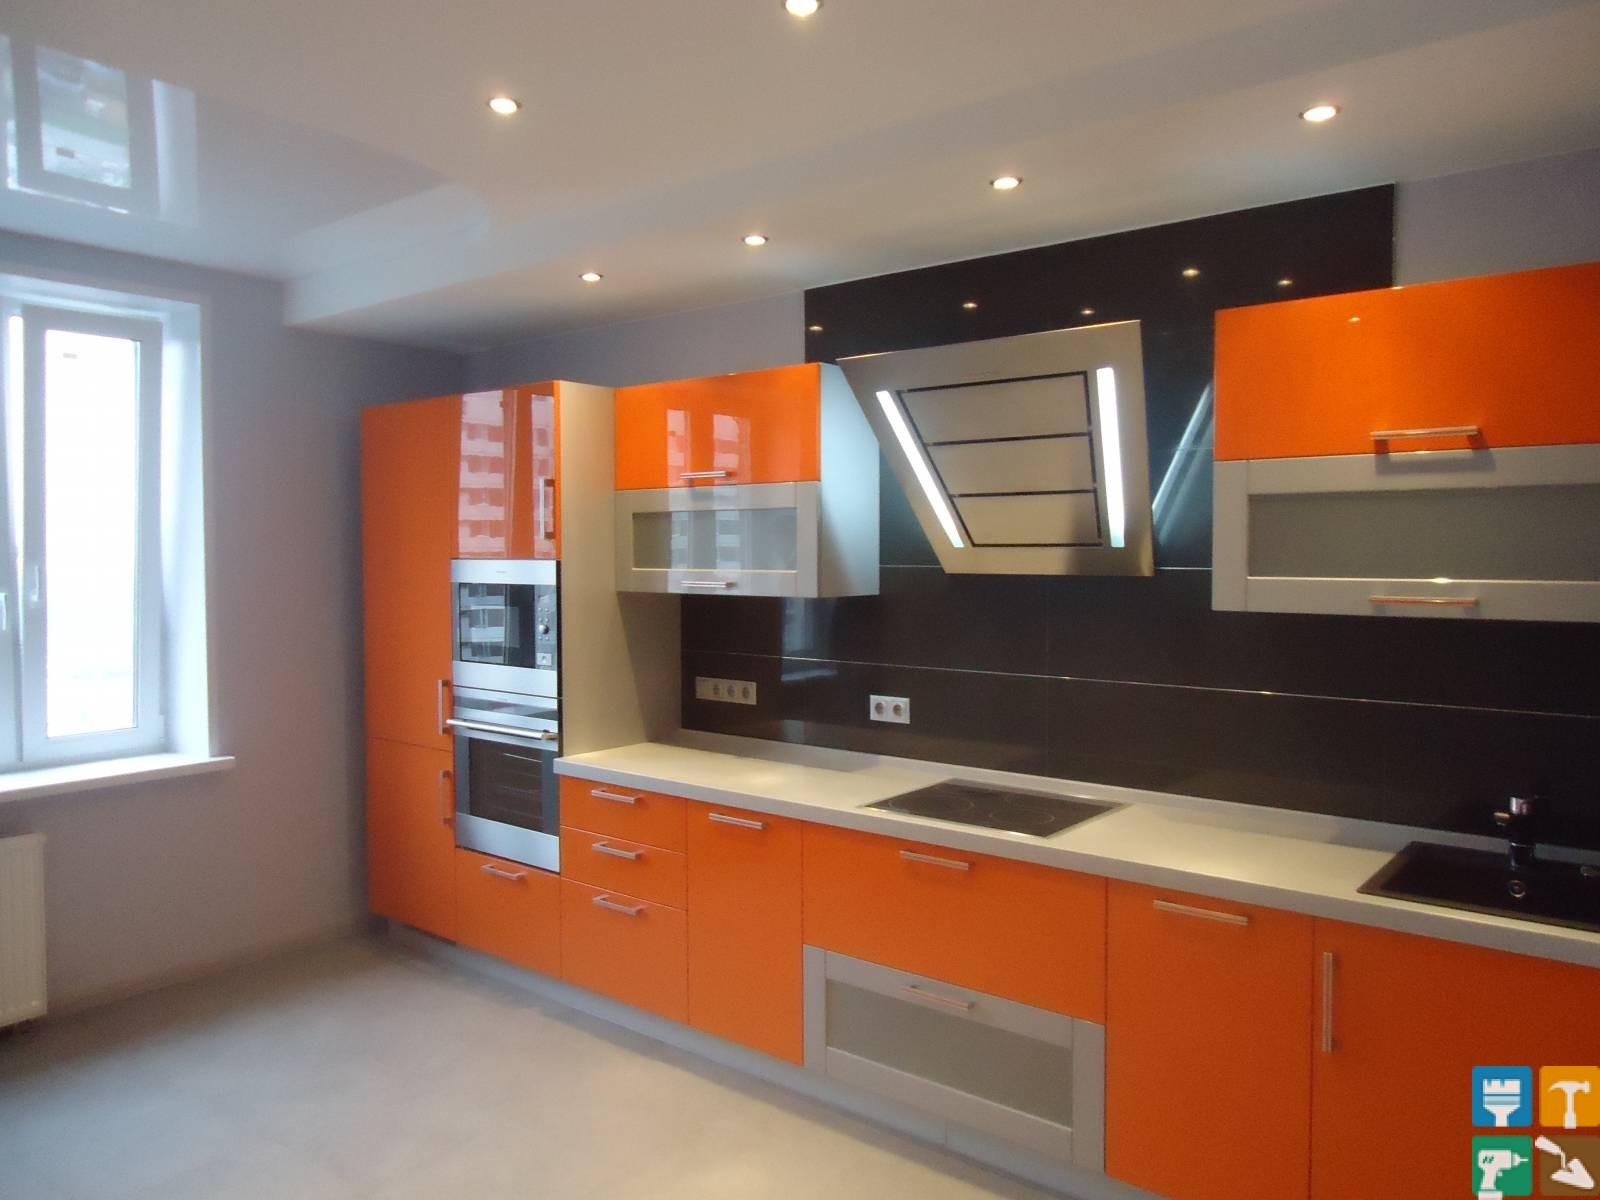 Дизайн проект маленькой комнаты - дизайн интерьера